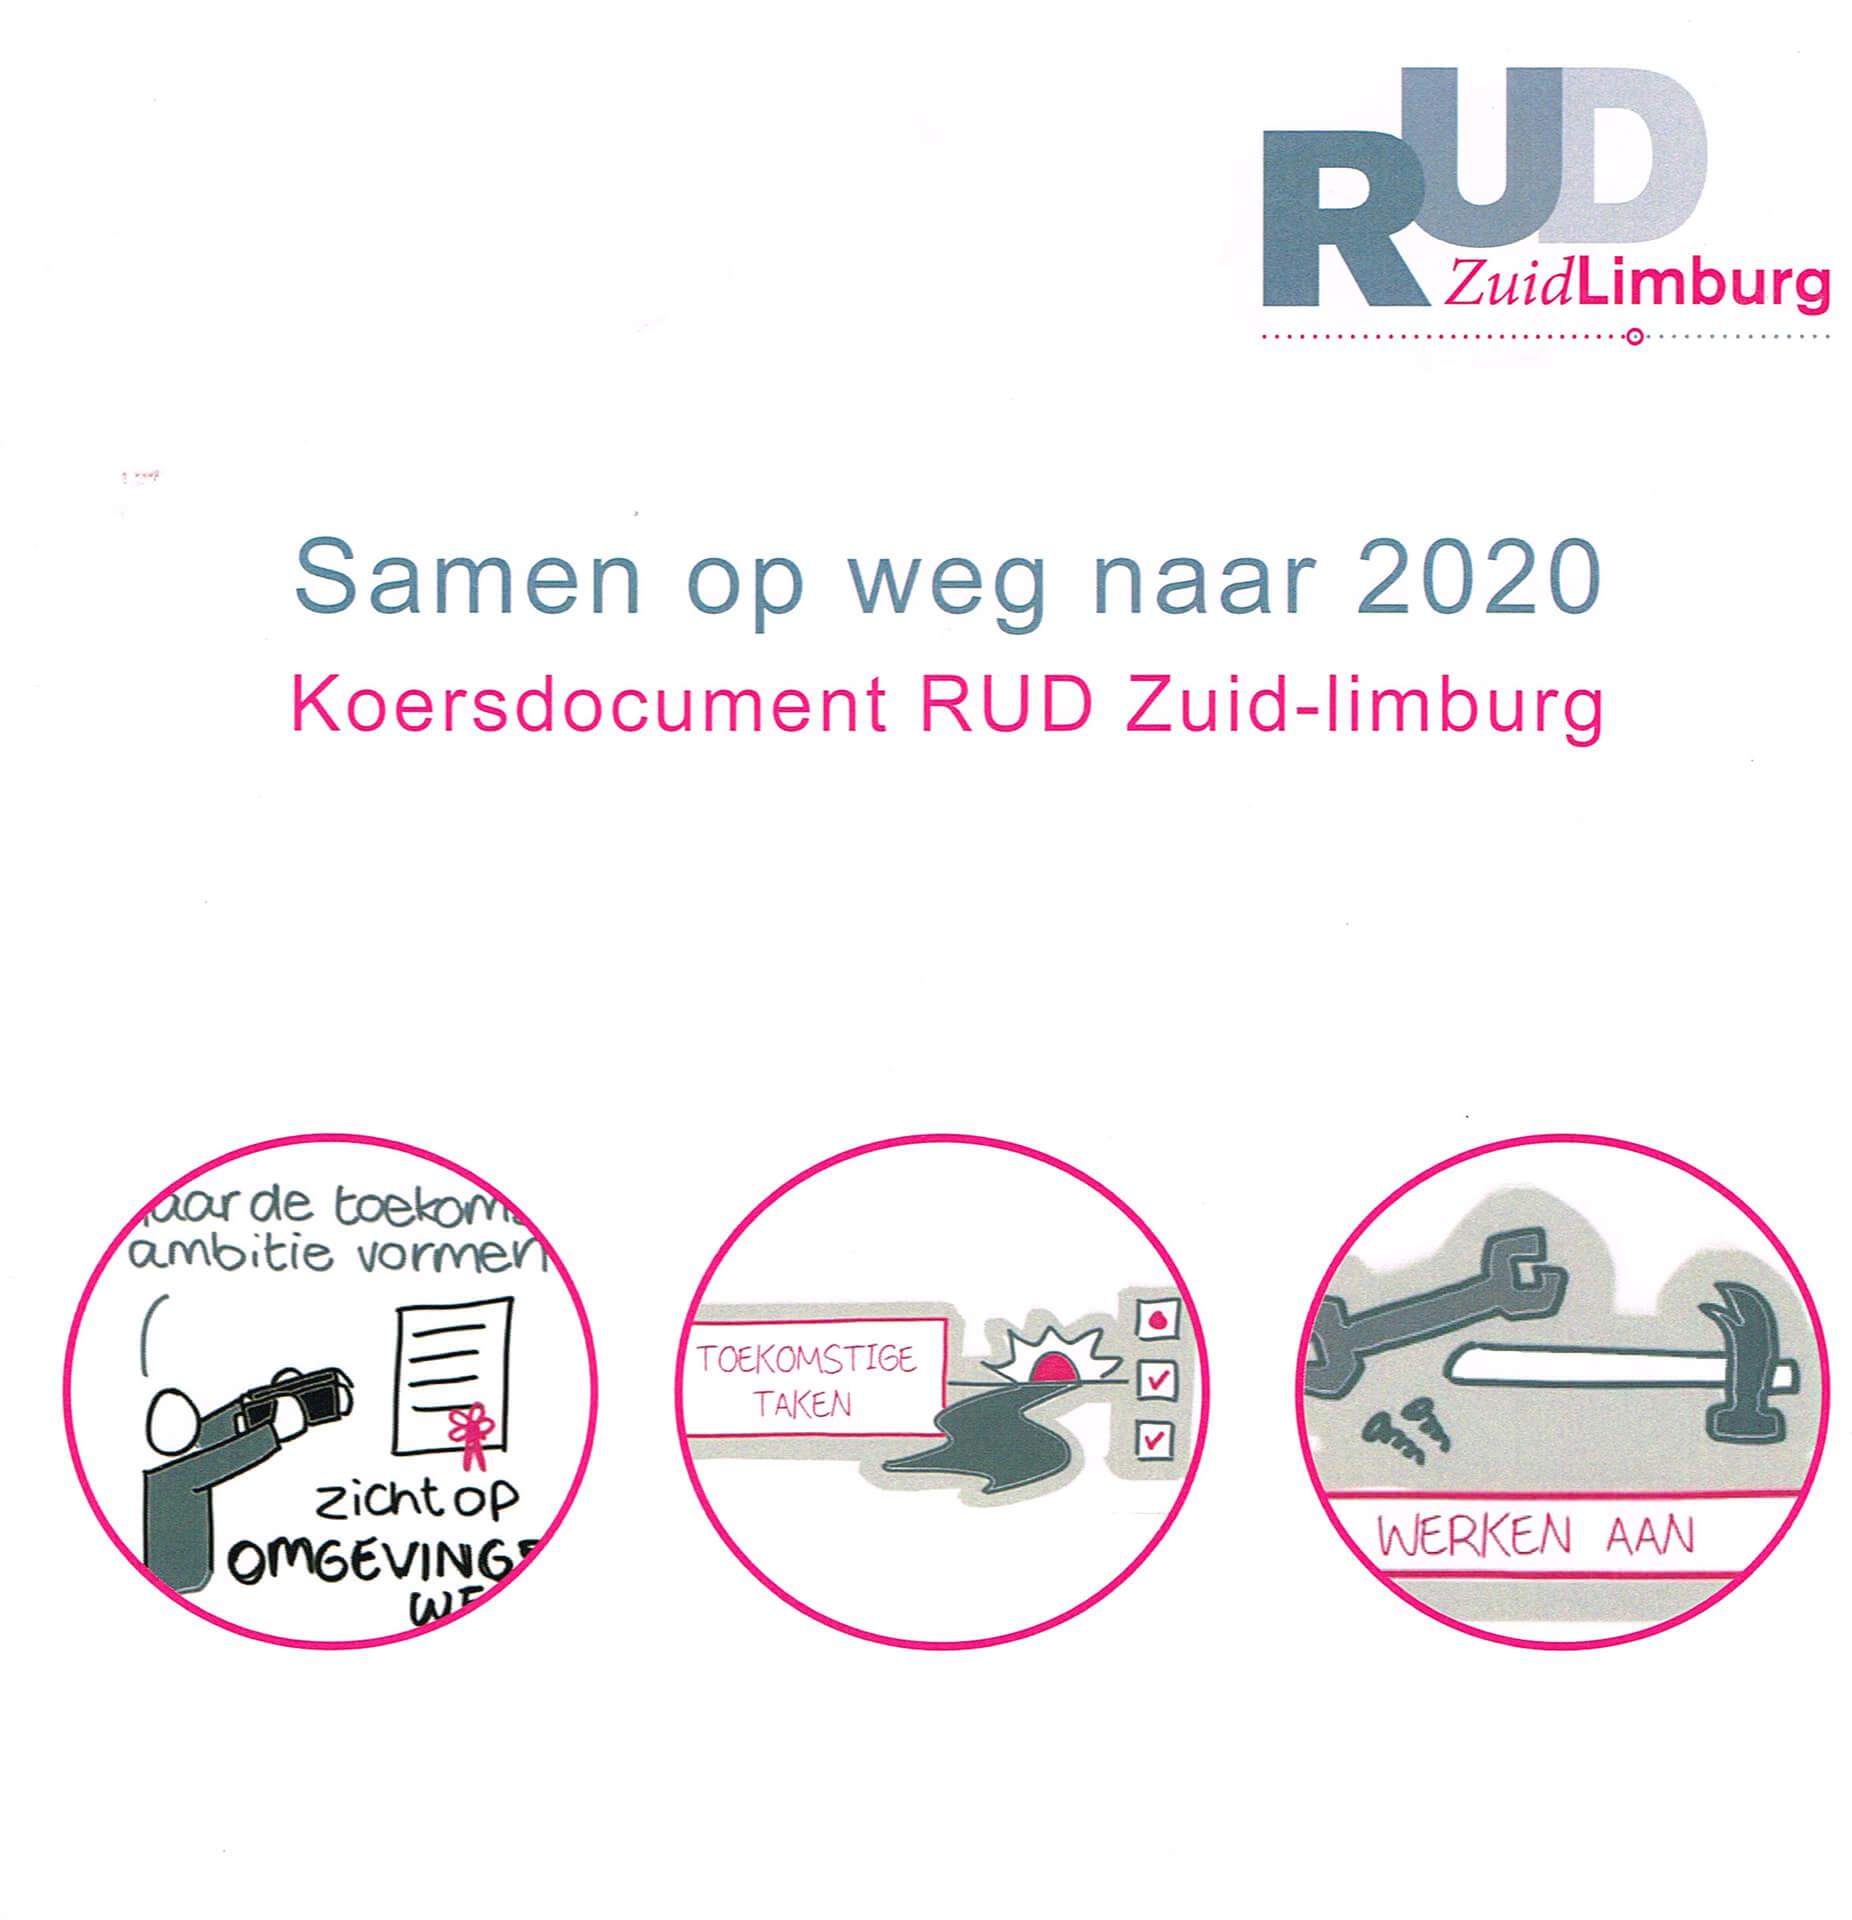 RUD Zuidlimburg